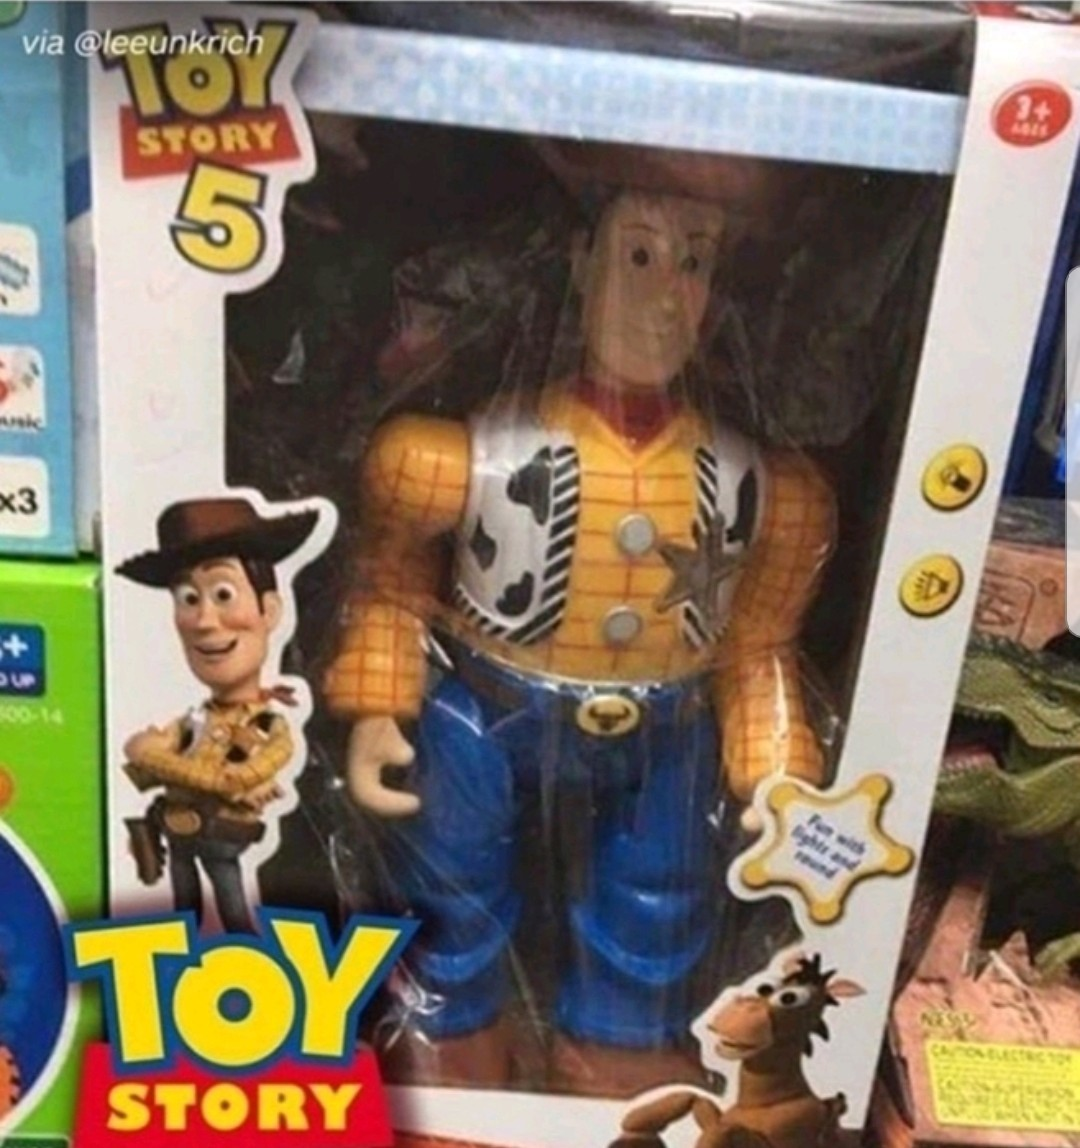 Fijense que pone toy story 5 wadafak - meme